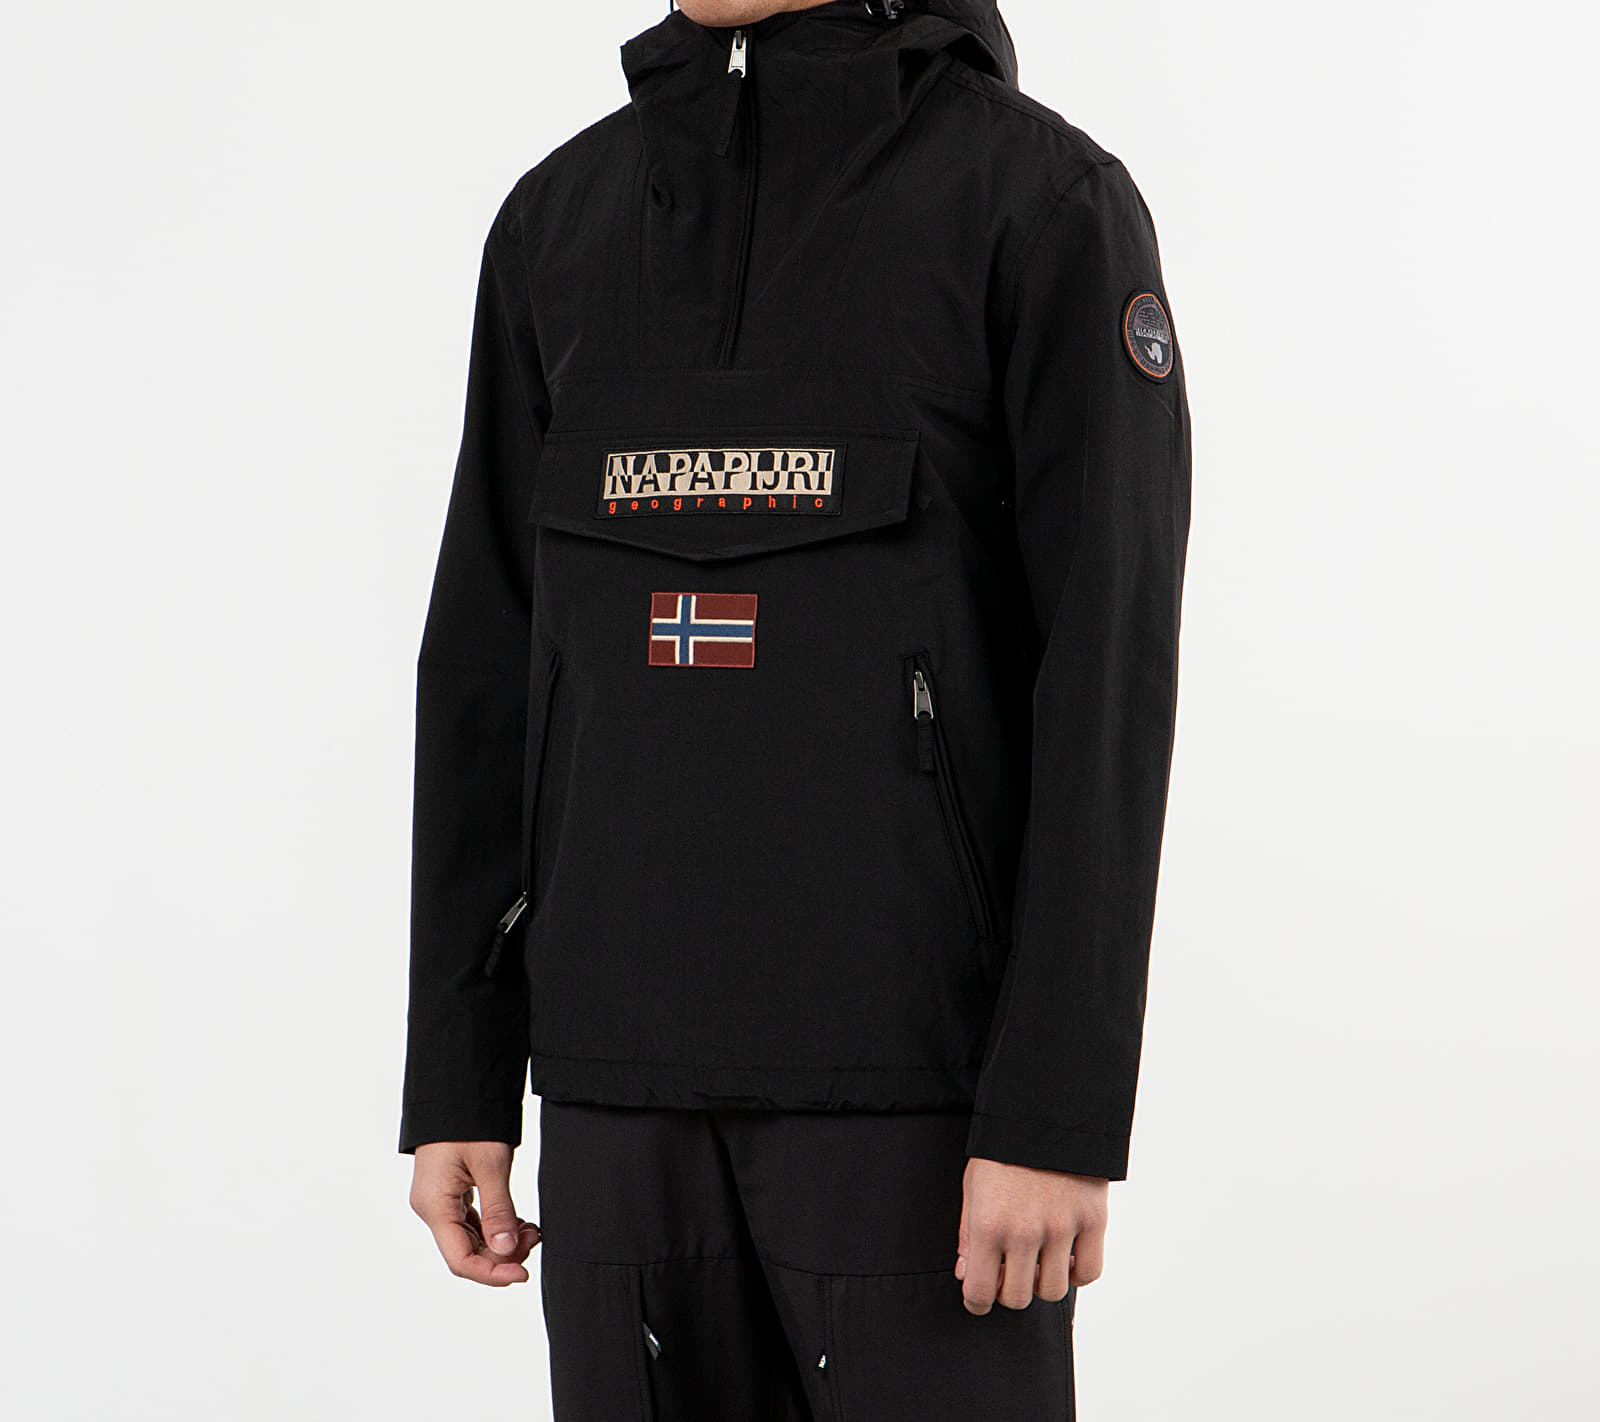 NAPAPIJRI Rainforest Pocket Jacket Black